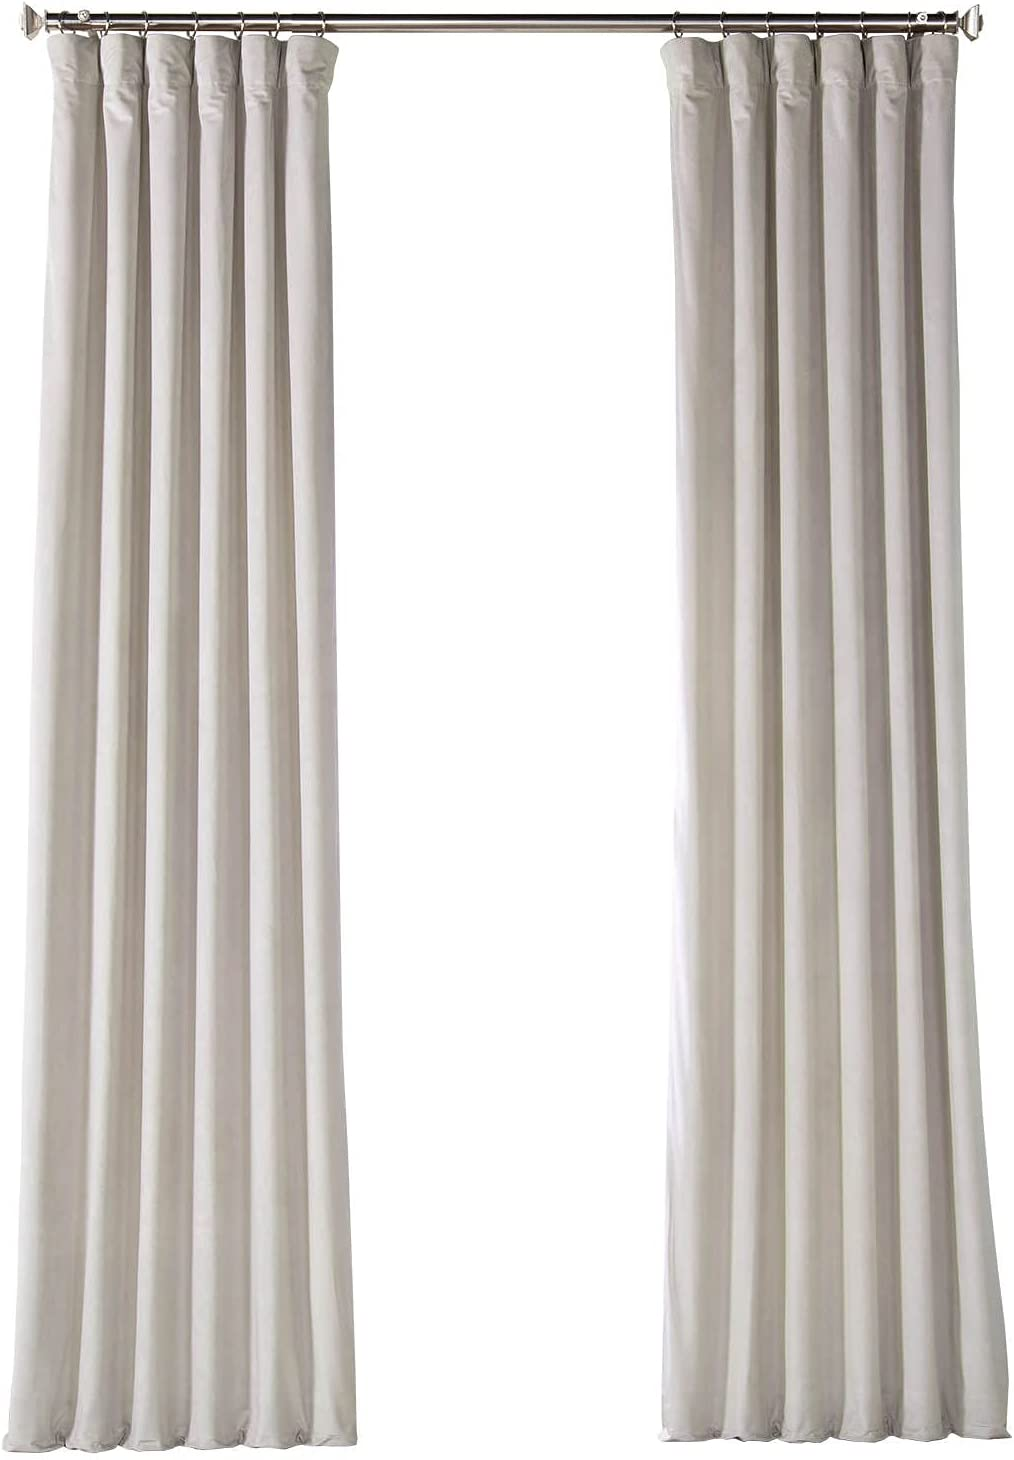 HPD Half Price Drapes VPYC Heritage Plush Velvet Curtain (1 Panel), 50 X 108, City Grey